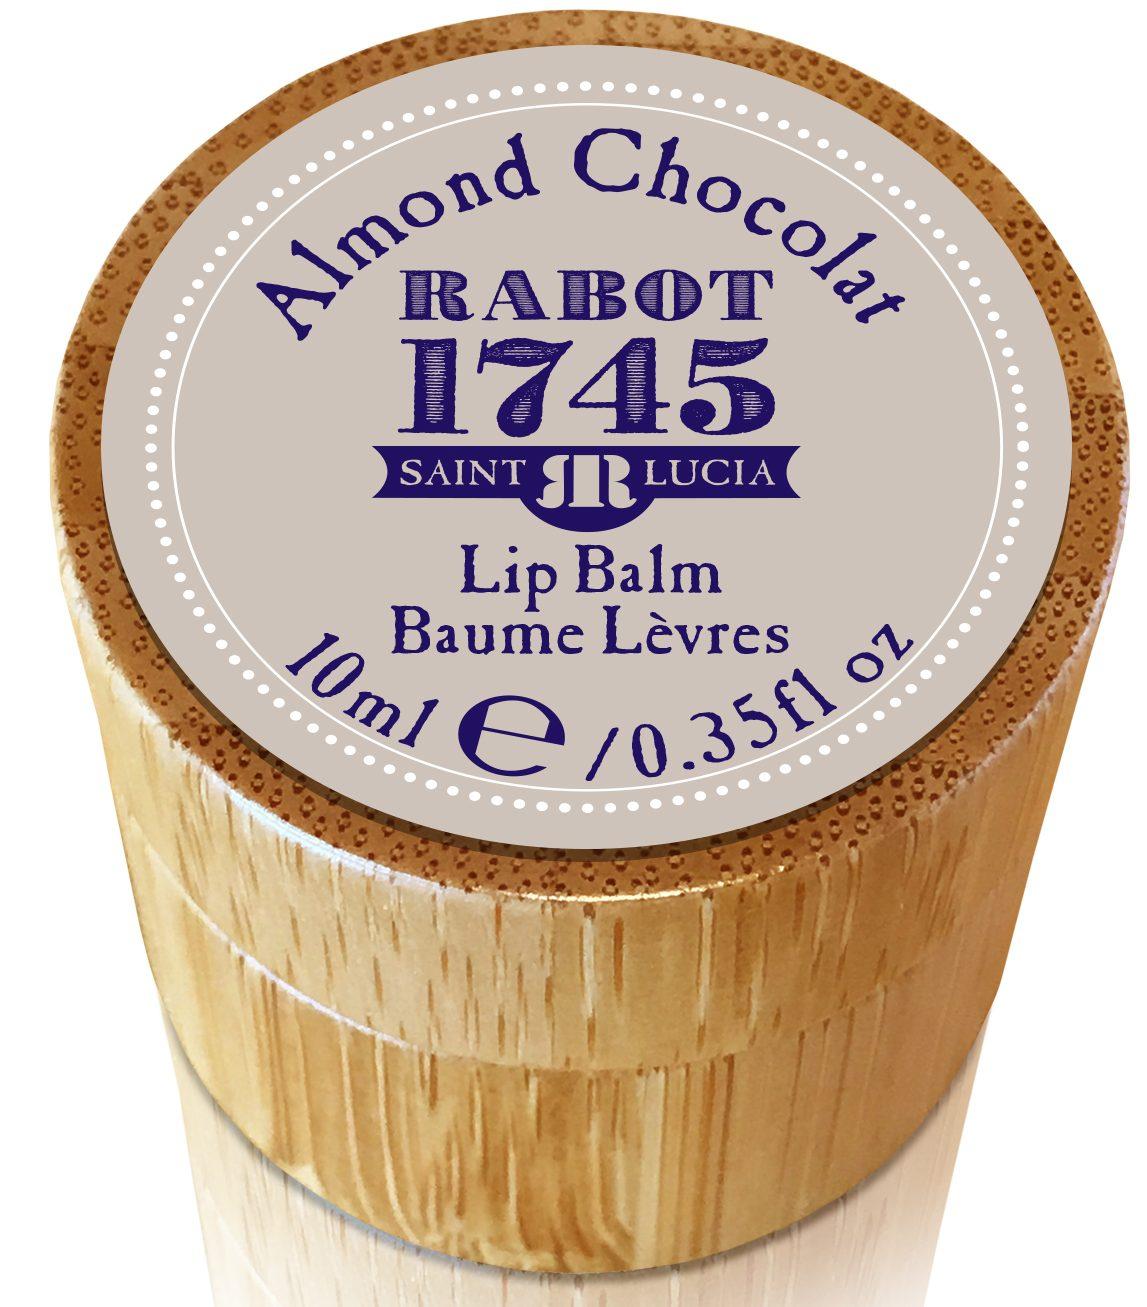 Chocolat Lip Balm rabot 1745